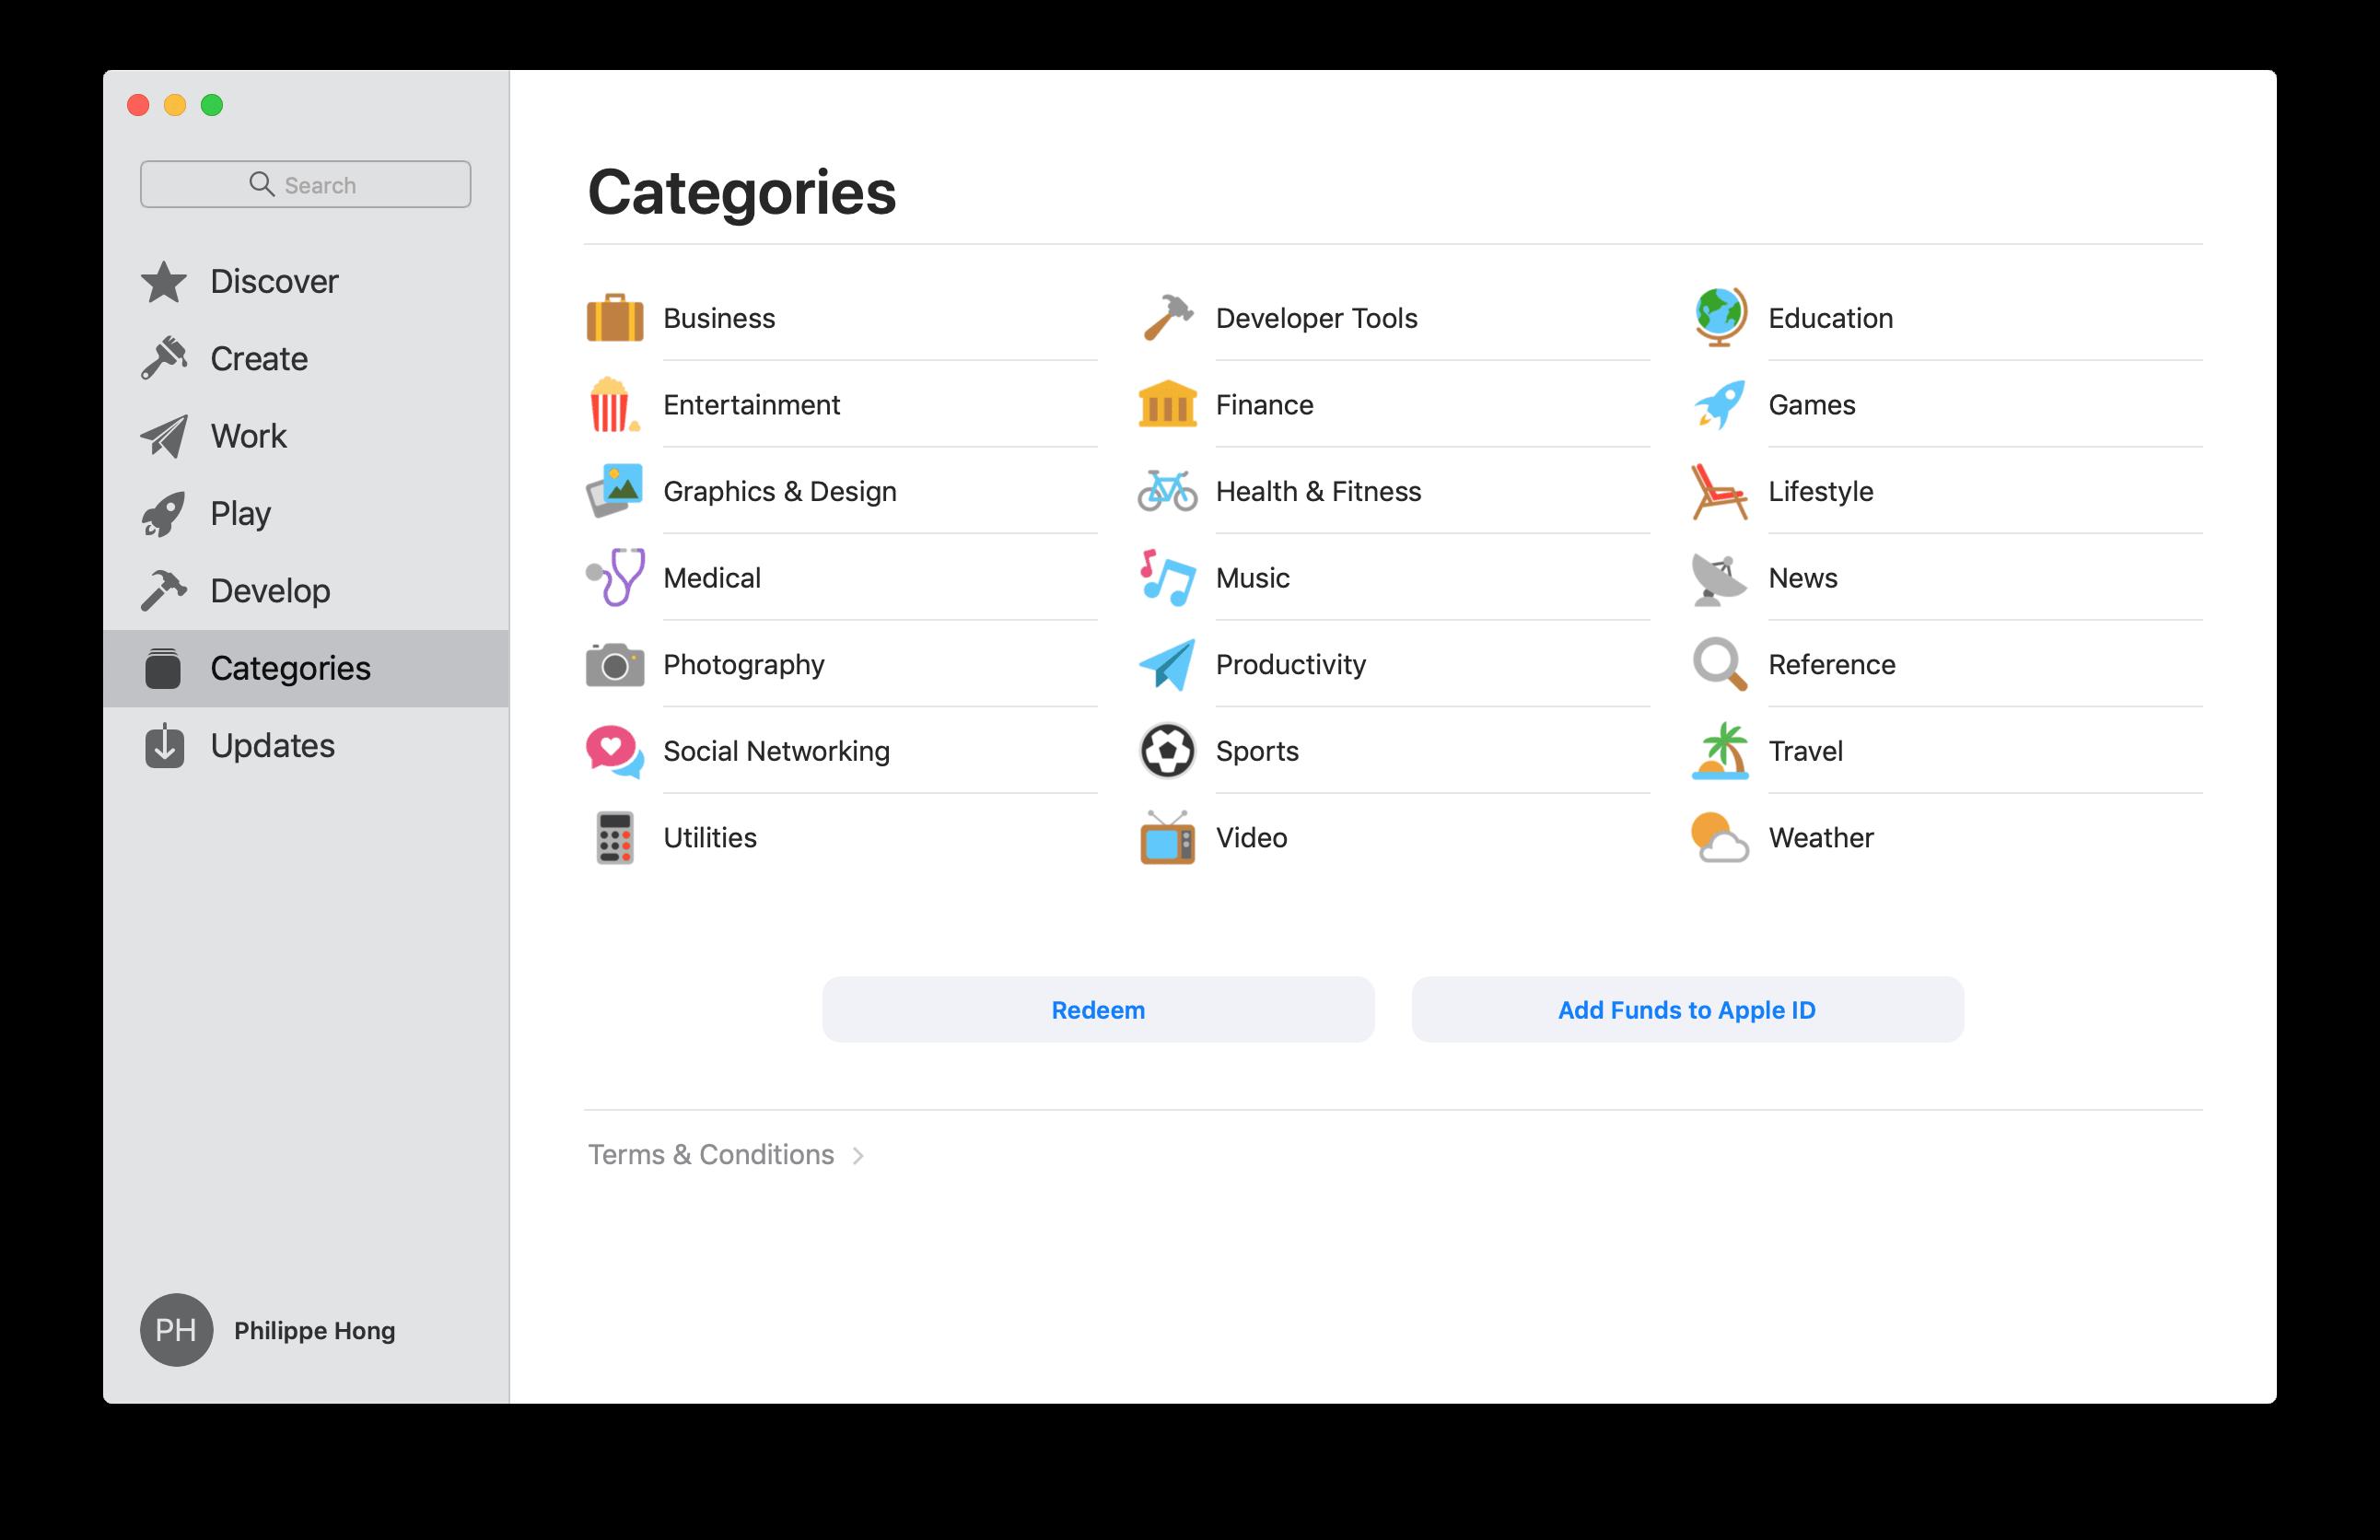 Categories by Mac App Store